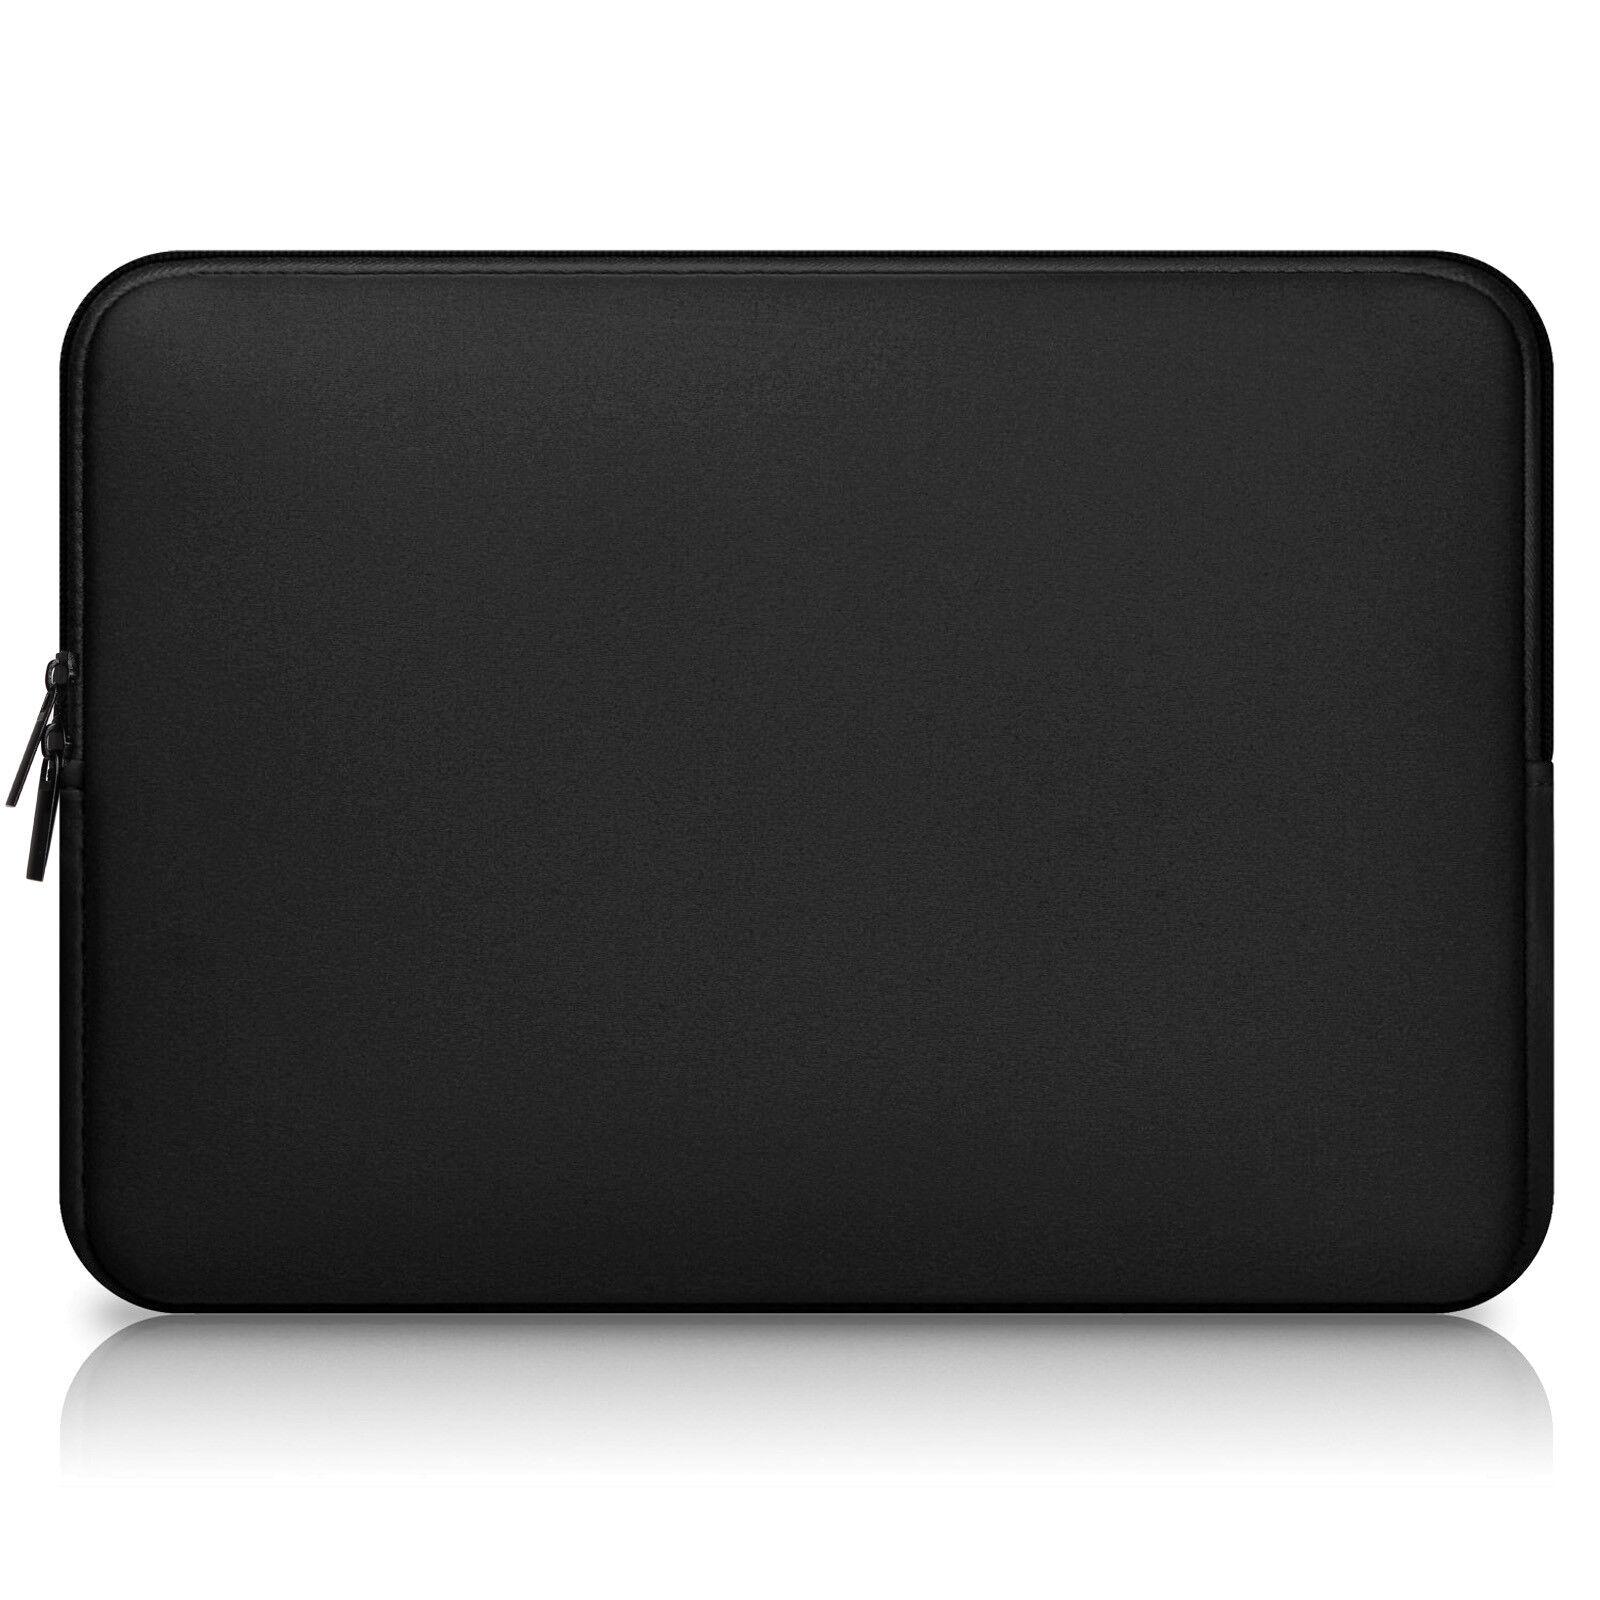 Shock Resistant Laptop Sleeve Case For 2018 MacBook Pro 15 I